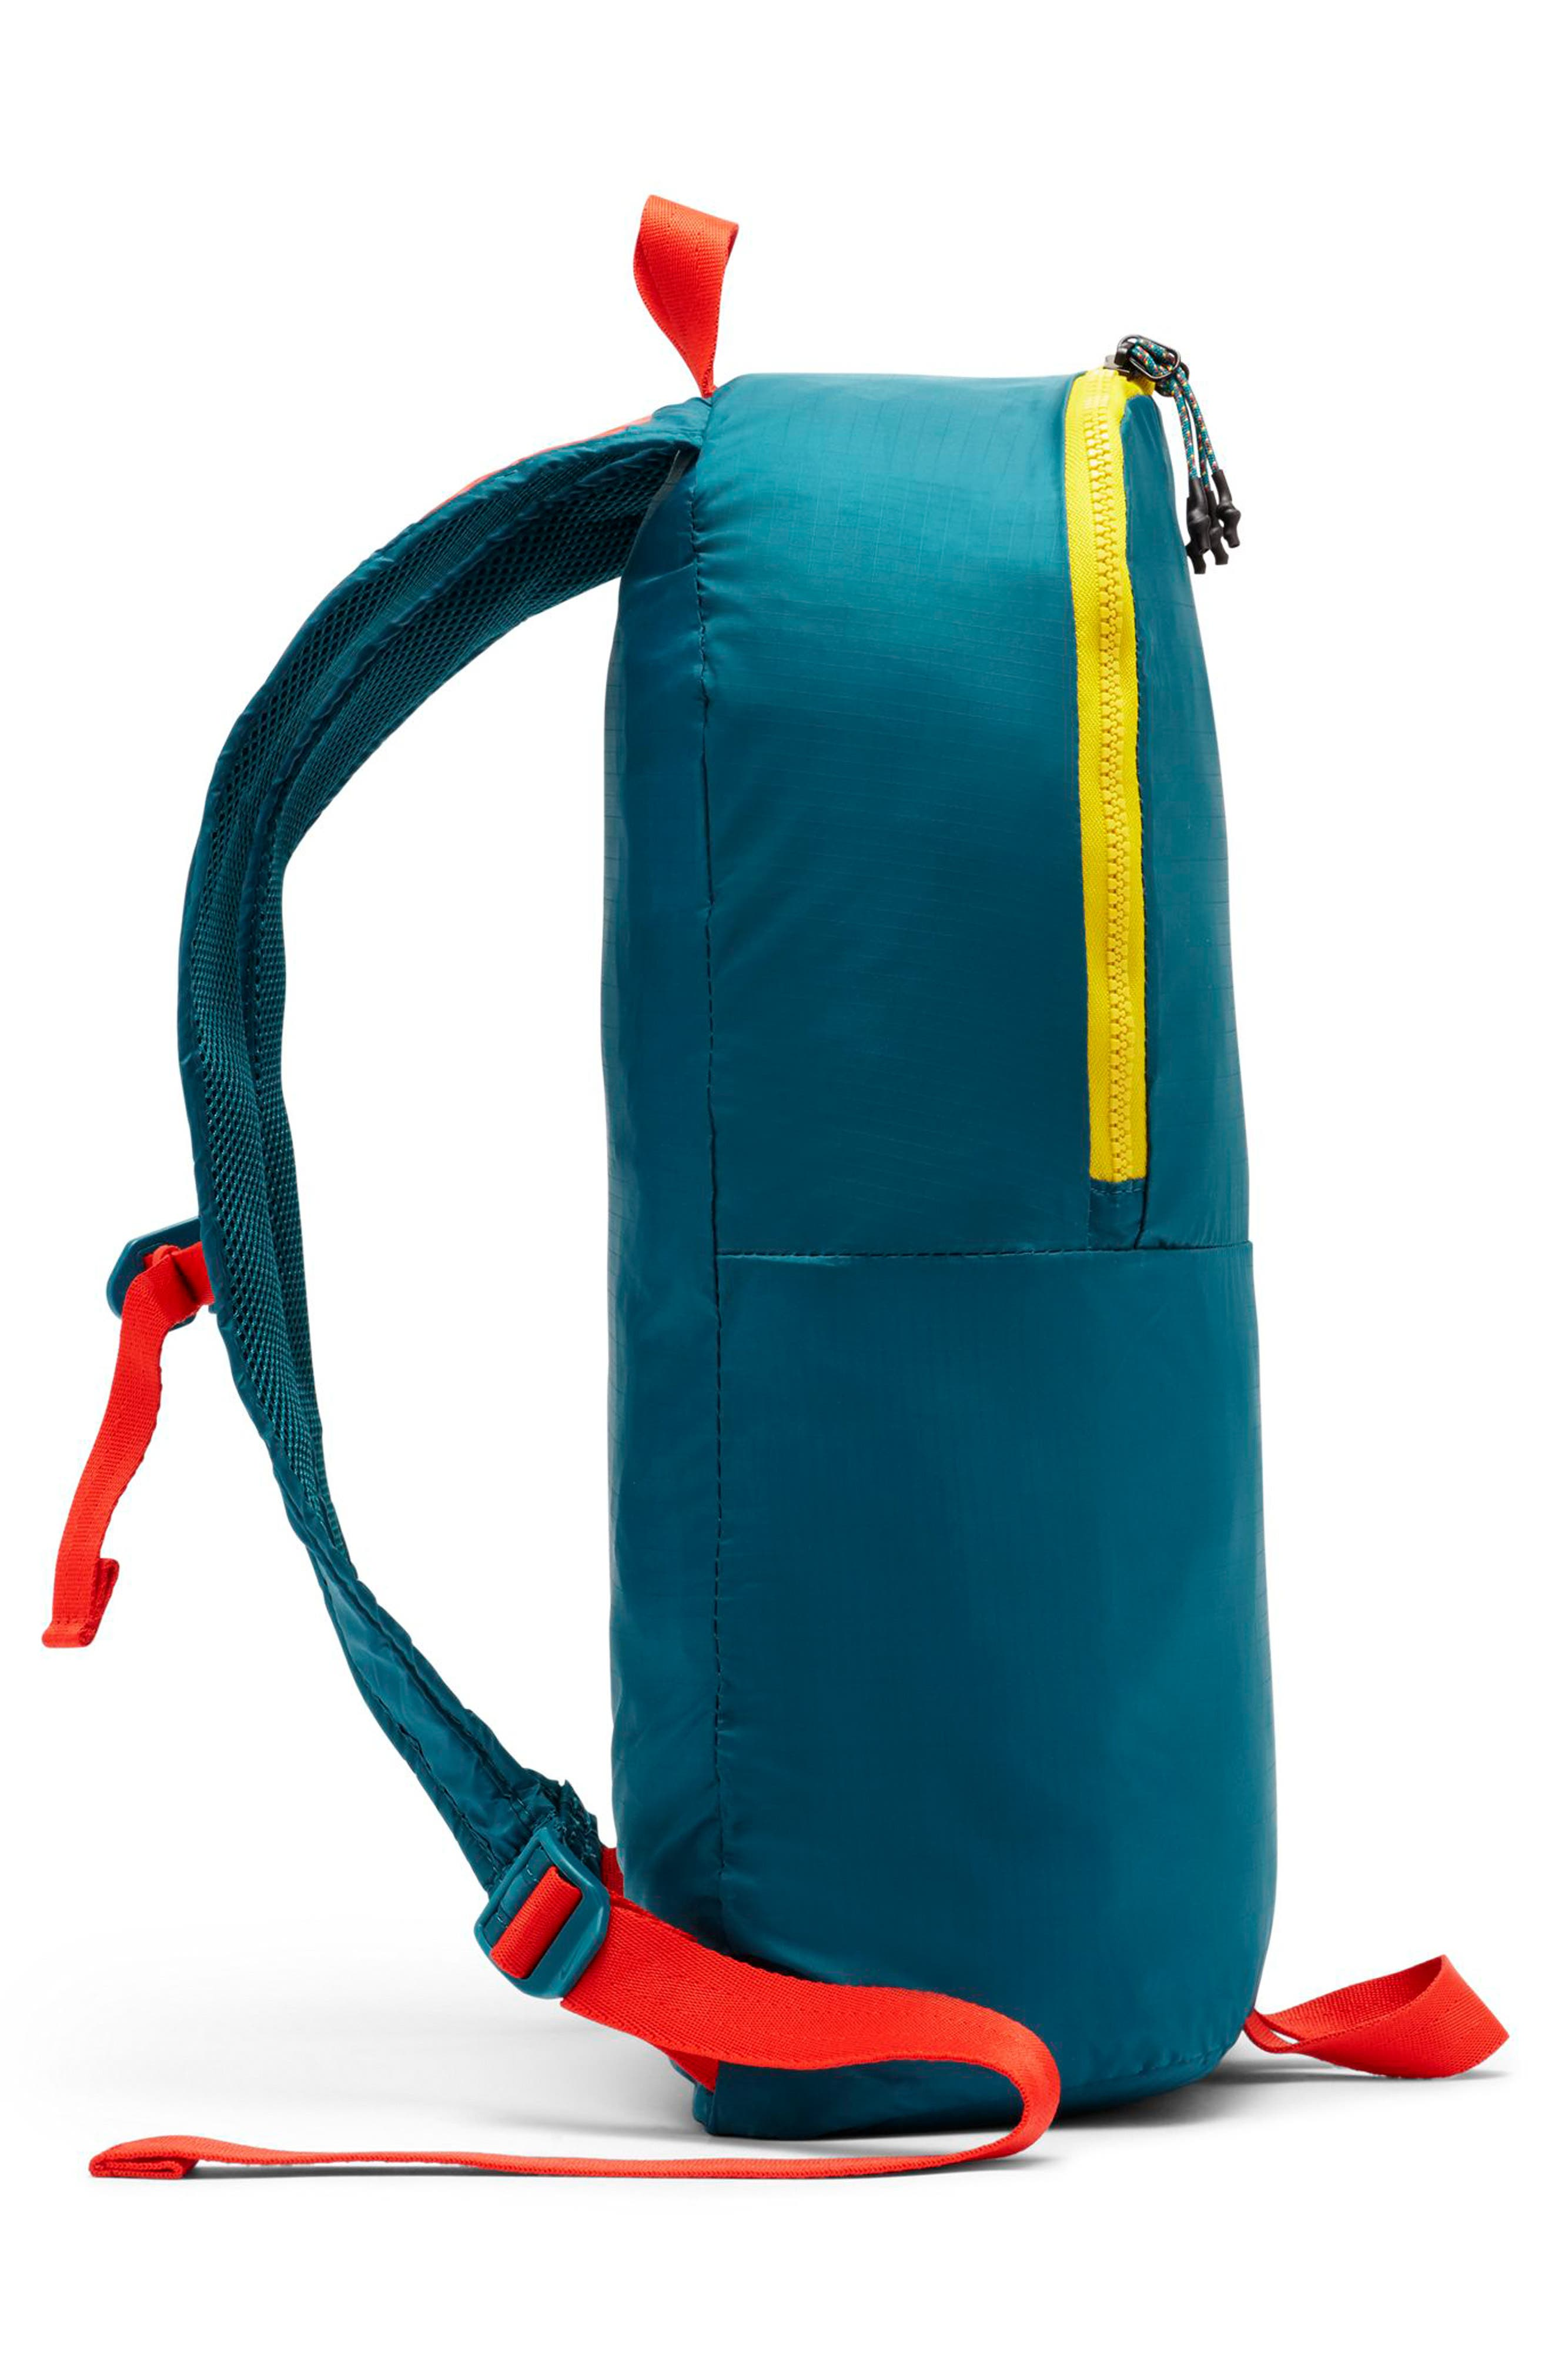 ACG Packable Backpack,                             Alternate thumbnail 4, color,                             GEODE TEAL/ GEODE TEAL